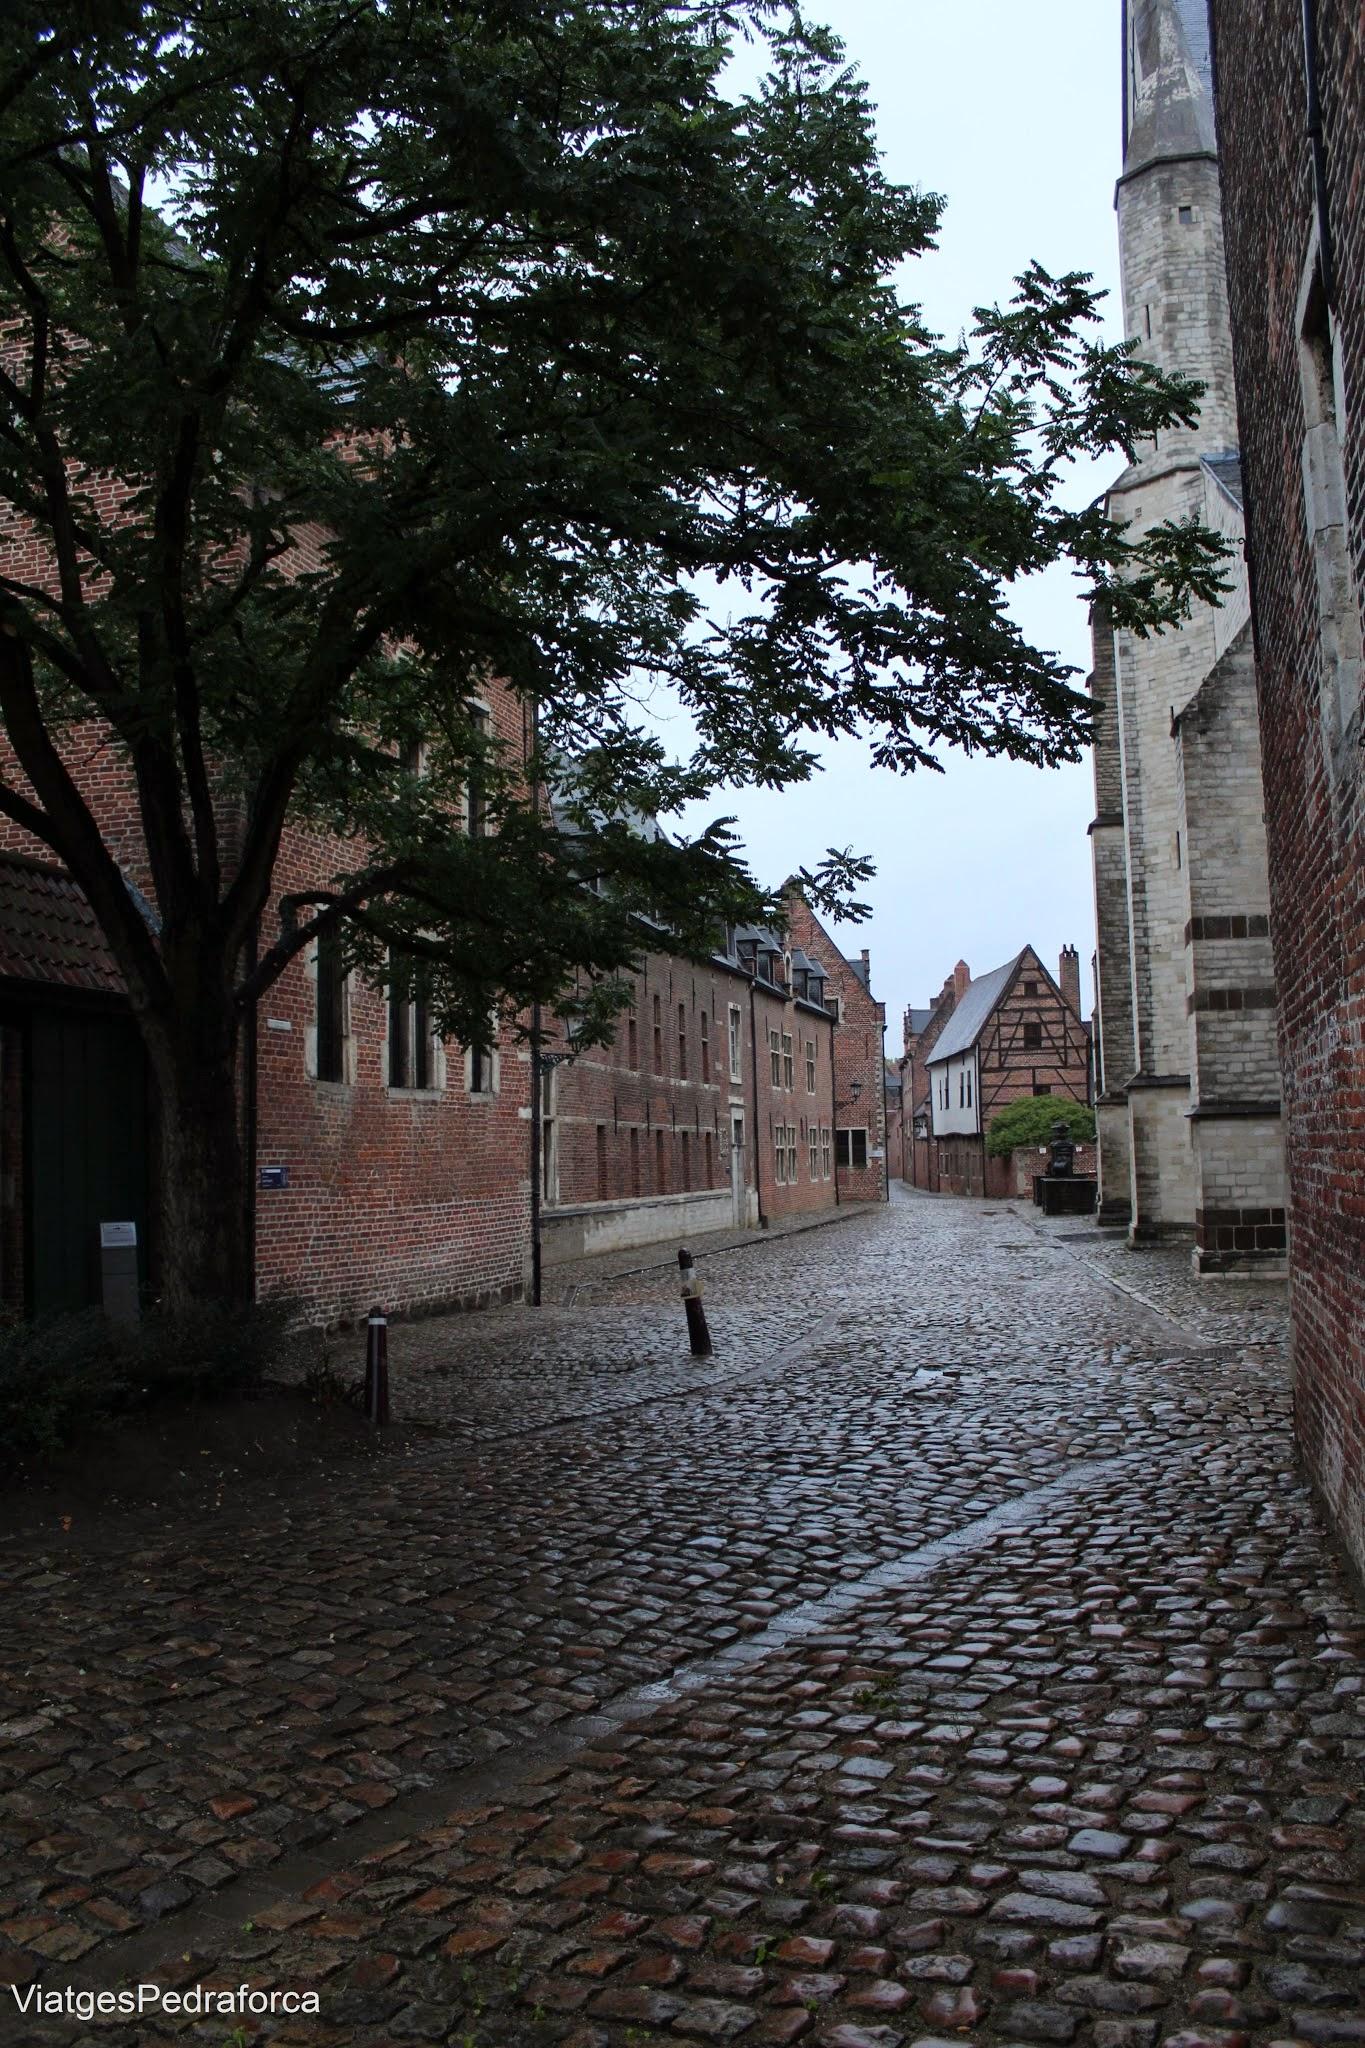 Begijnhof de Lovaina, Leuven, Flandes, Belgica, Beguinatge